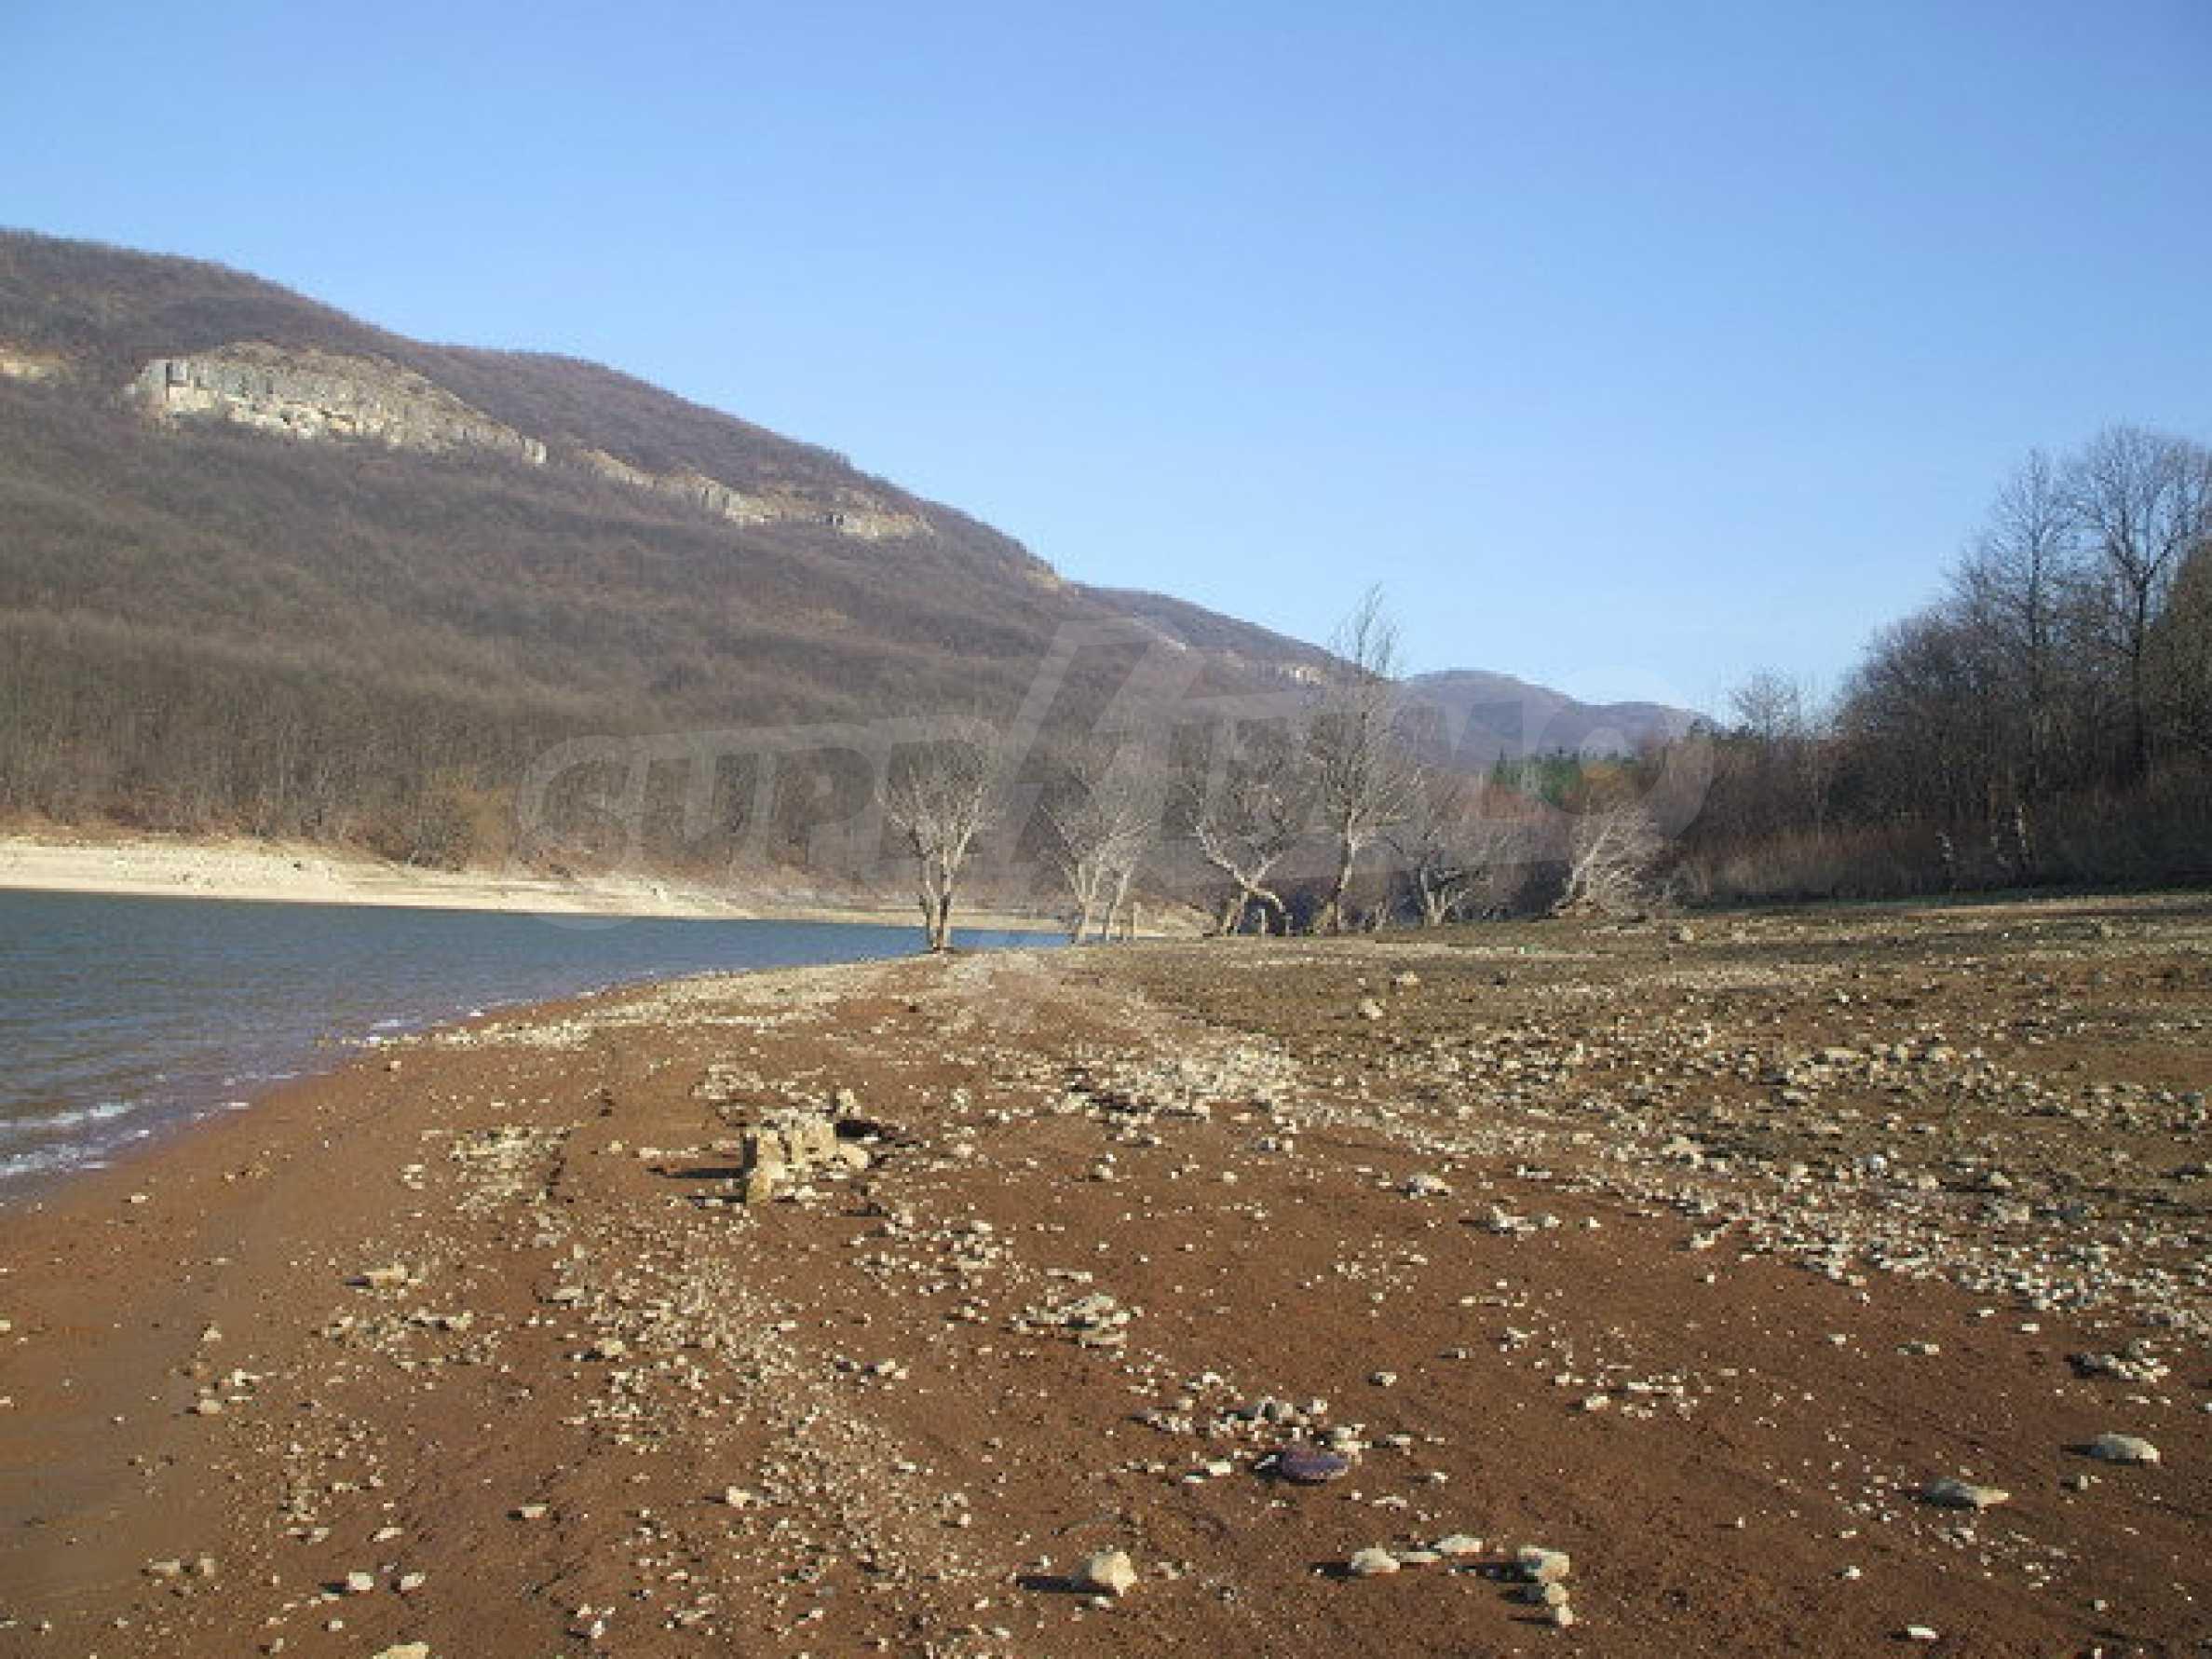 Land in regulation near Lake Alexander Stamboliyski 2